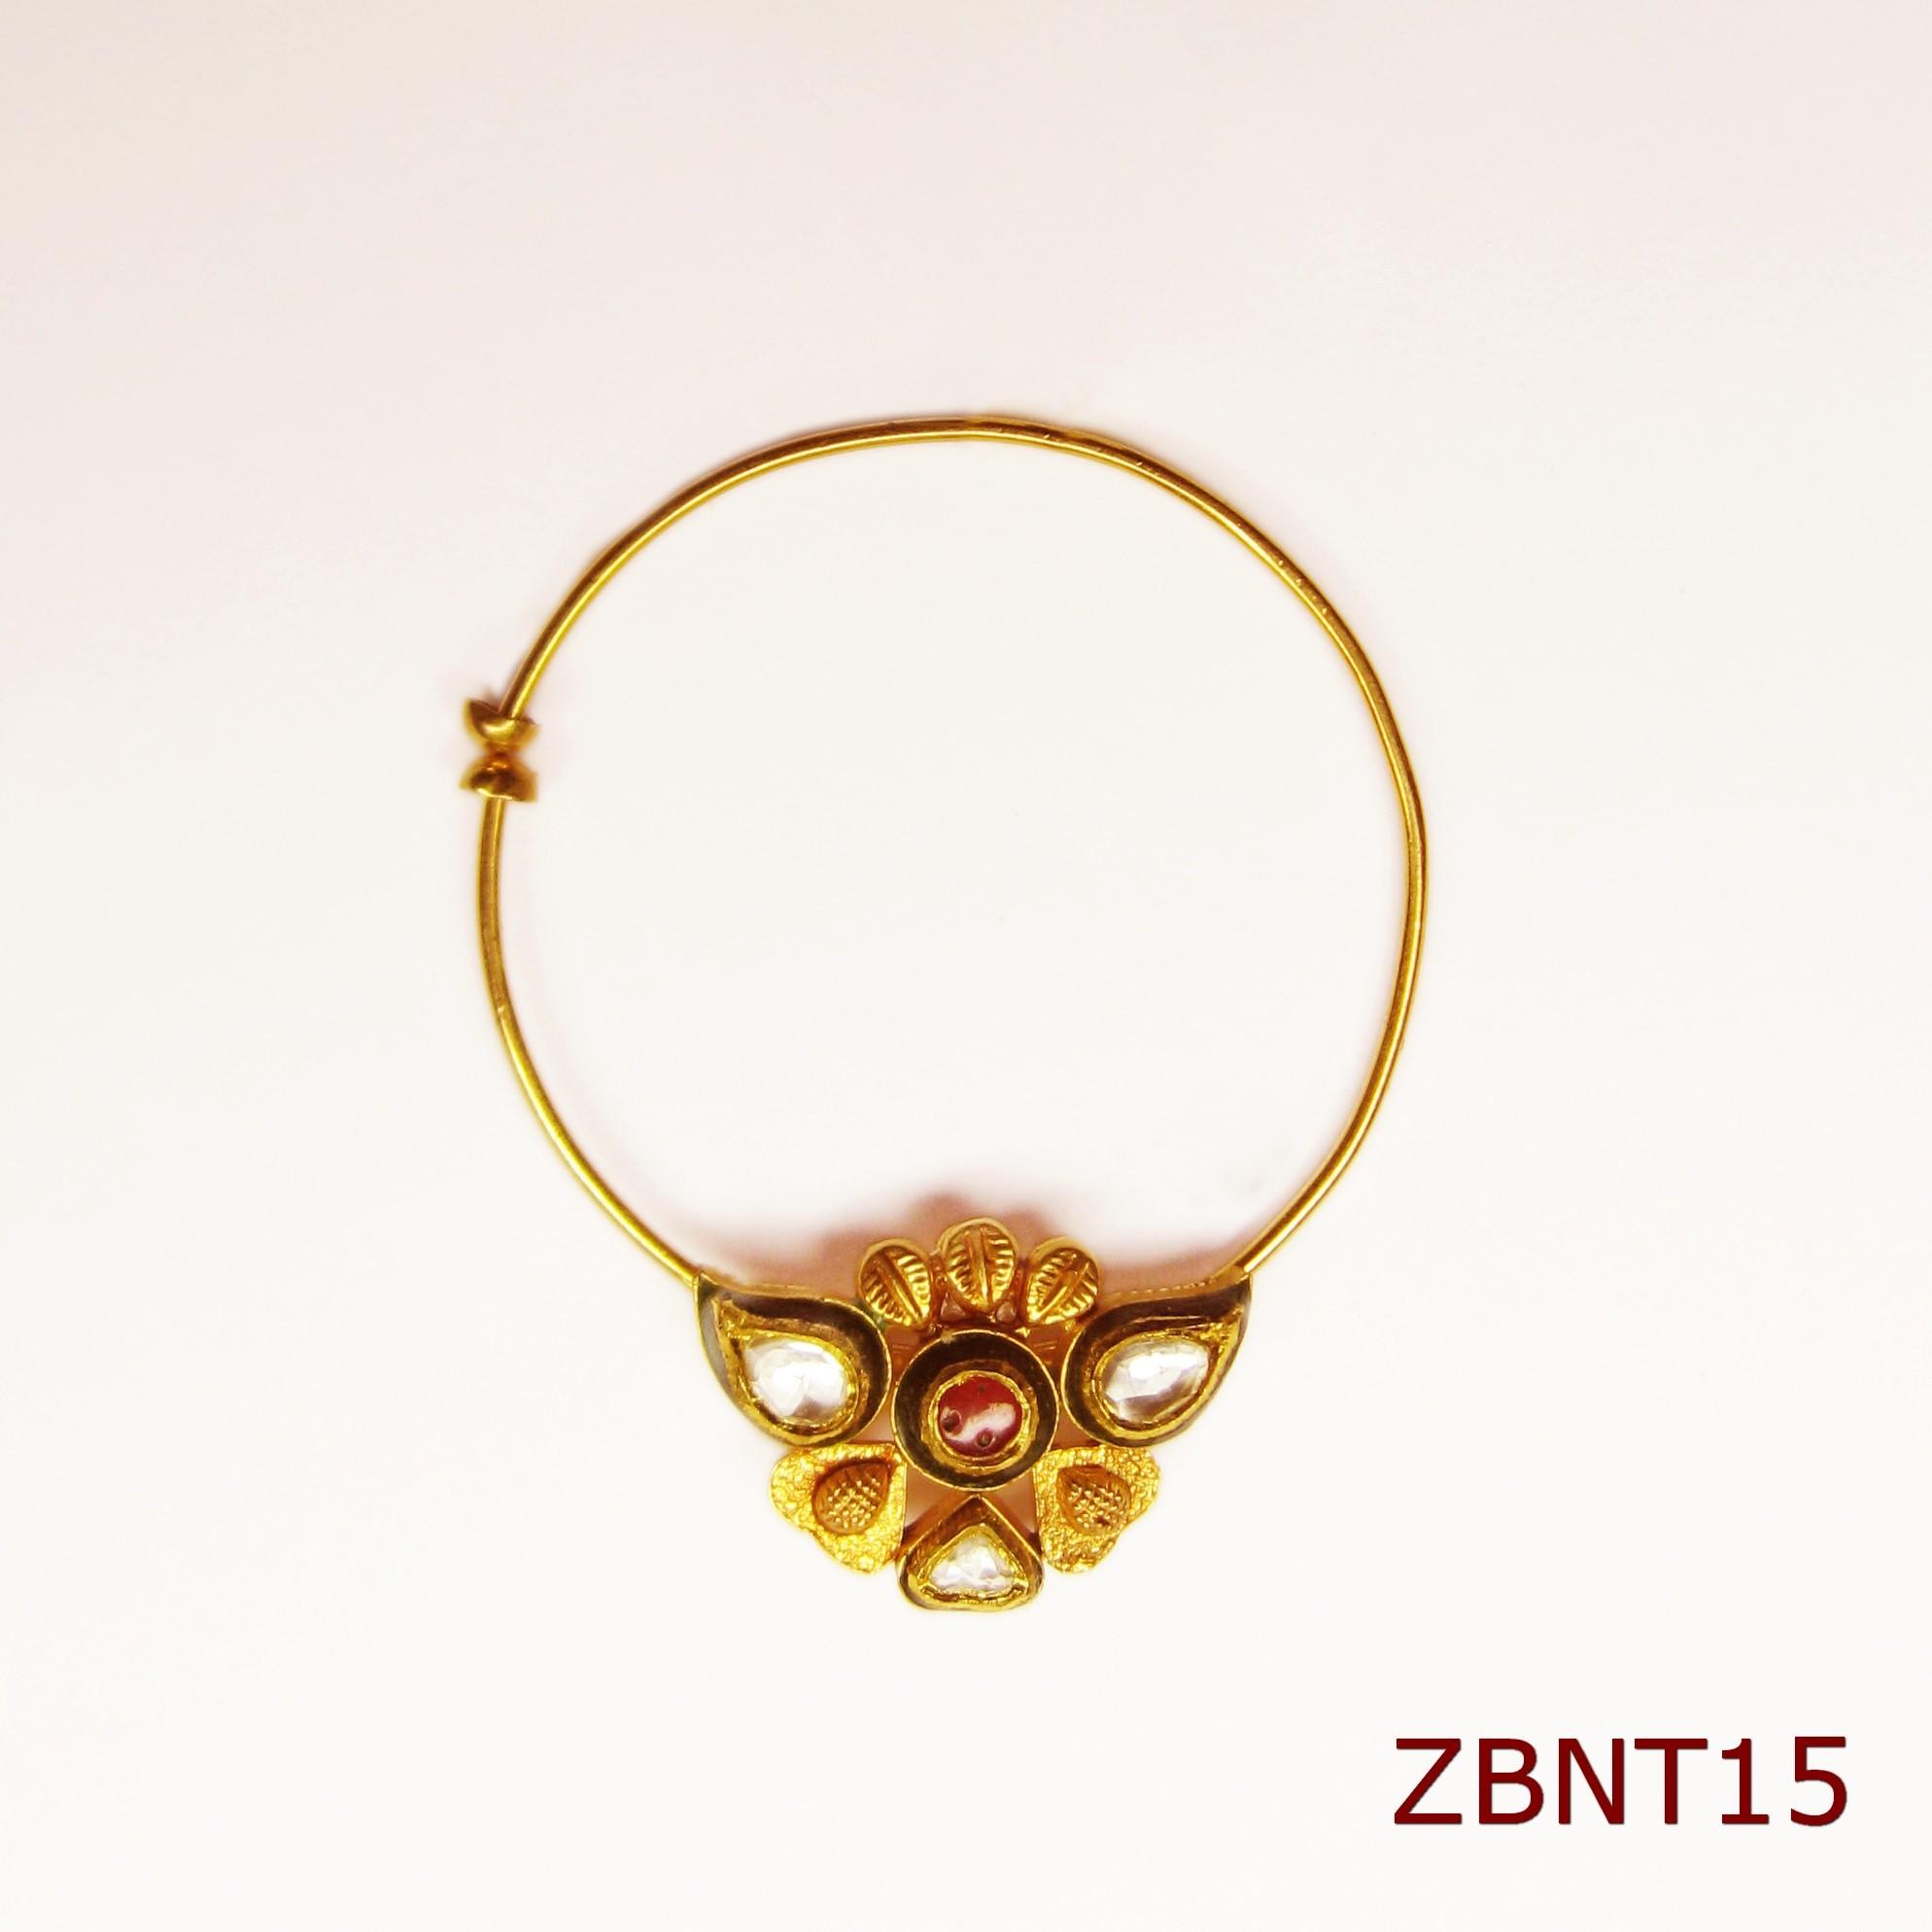 ZBNT15